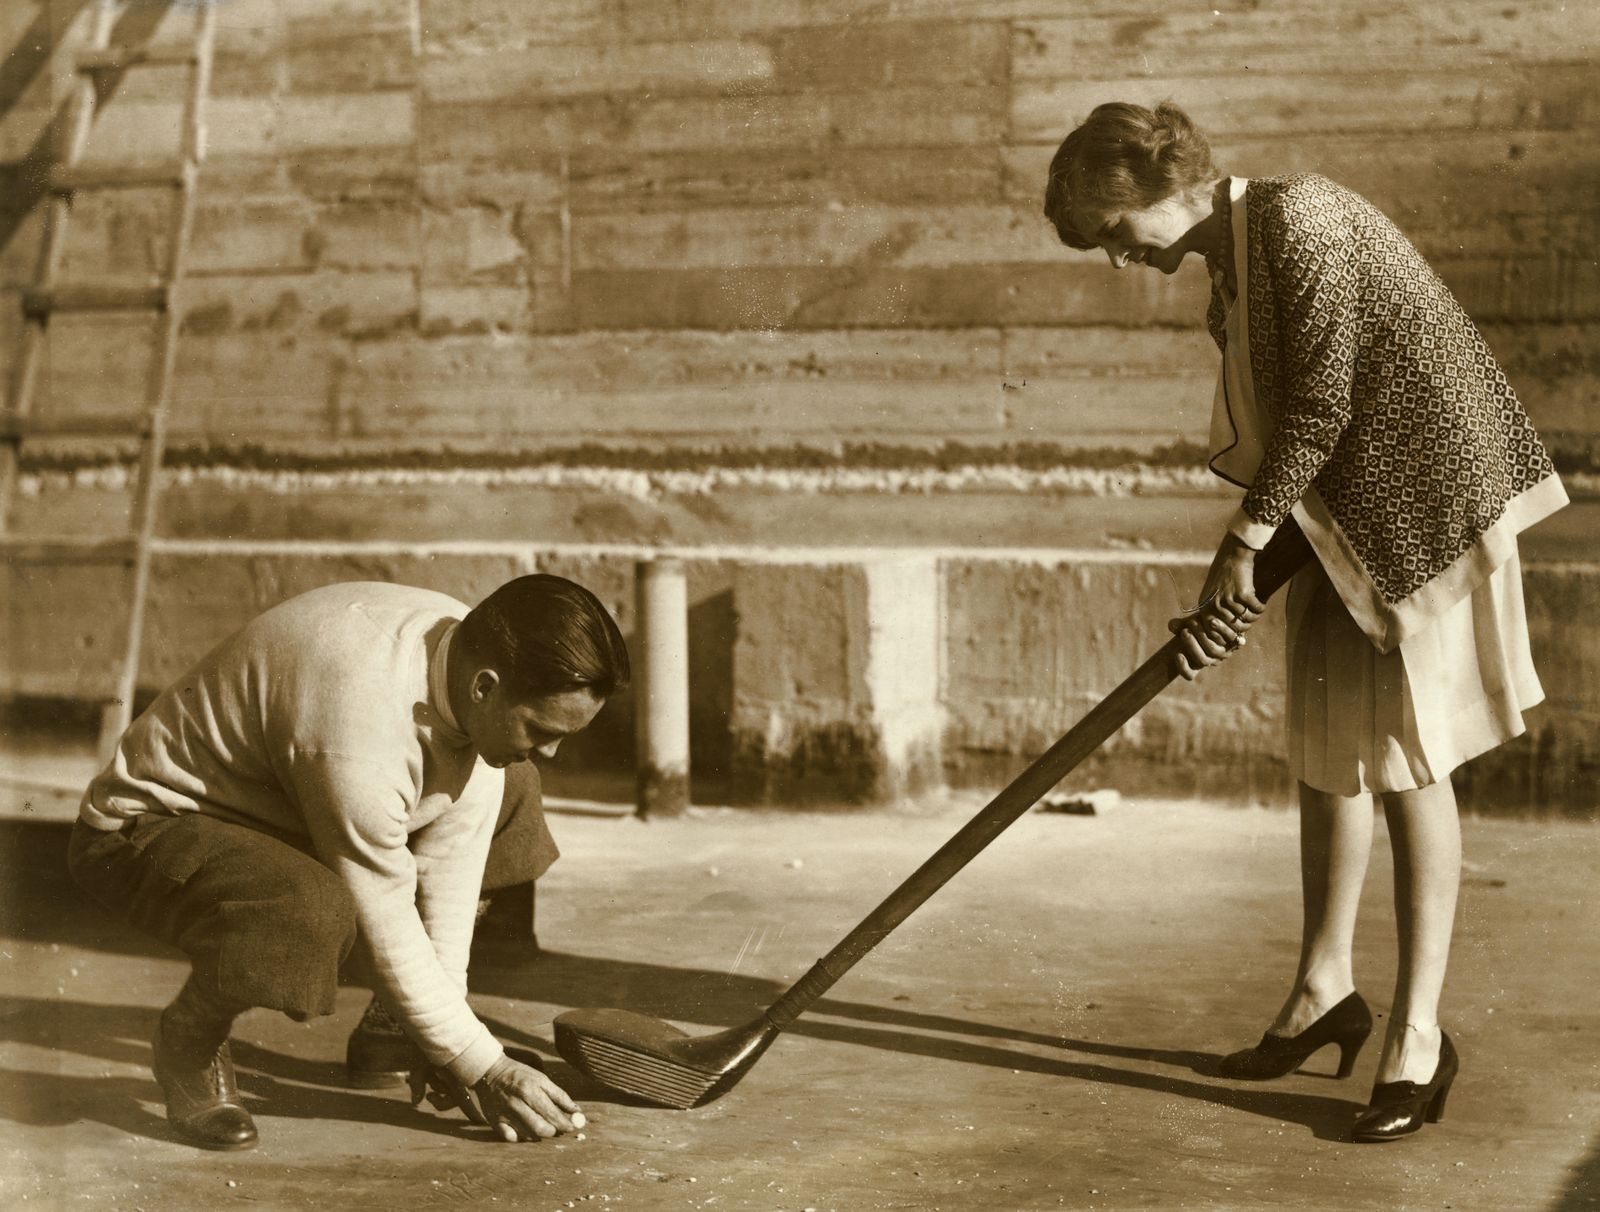 Jack Redmond - Woman Holding Large Golf Club